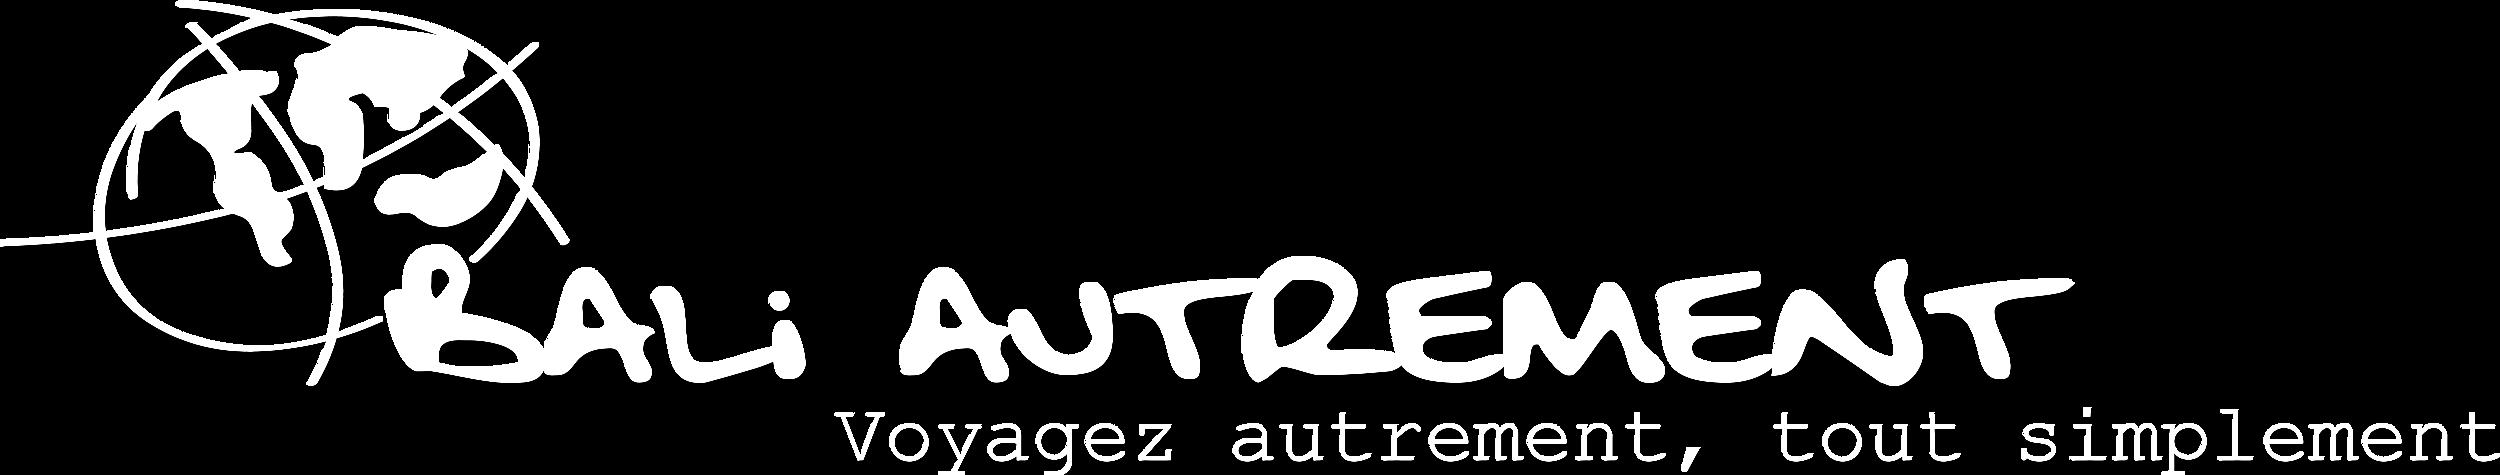 logo-ba-blanc-full (002).png